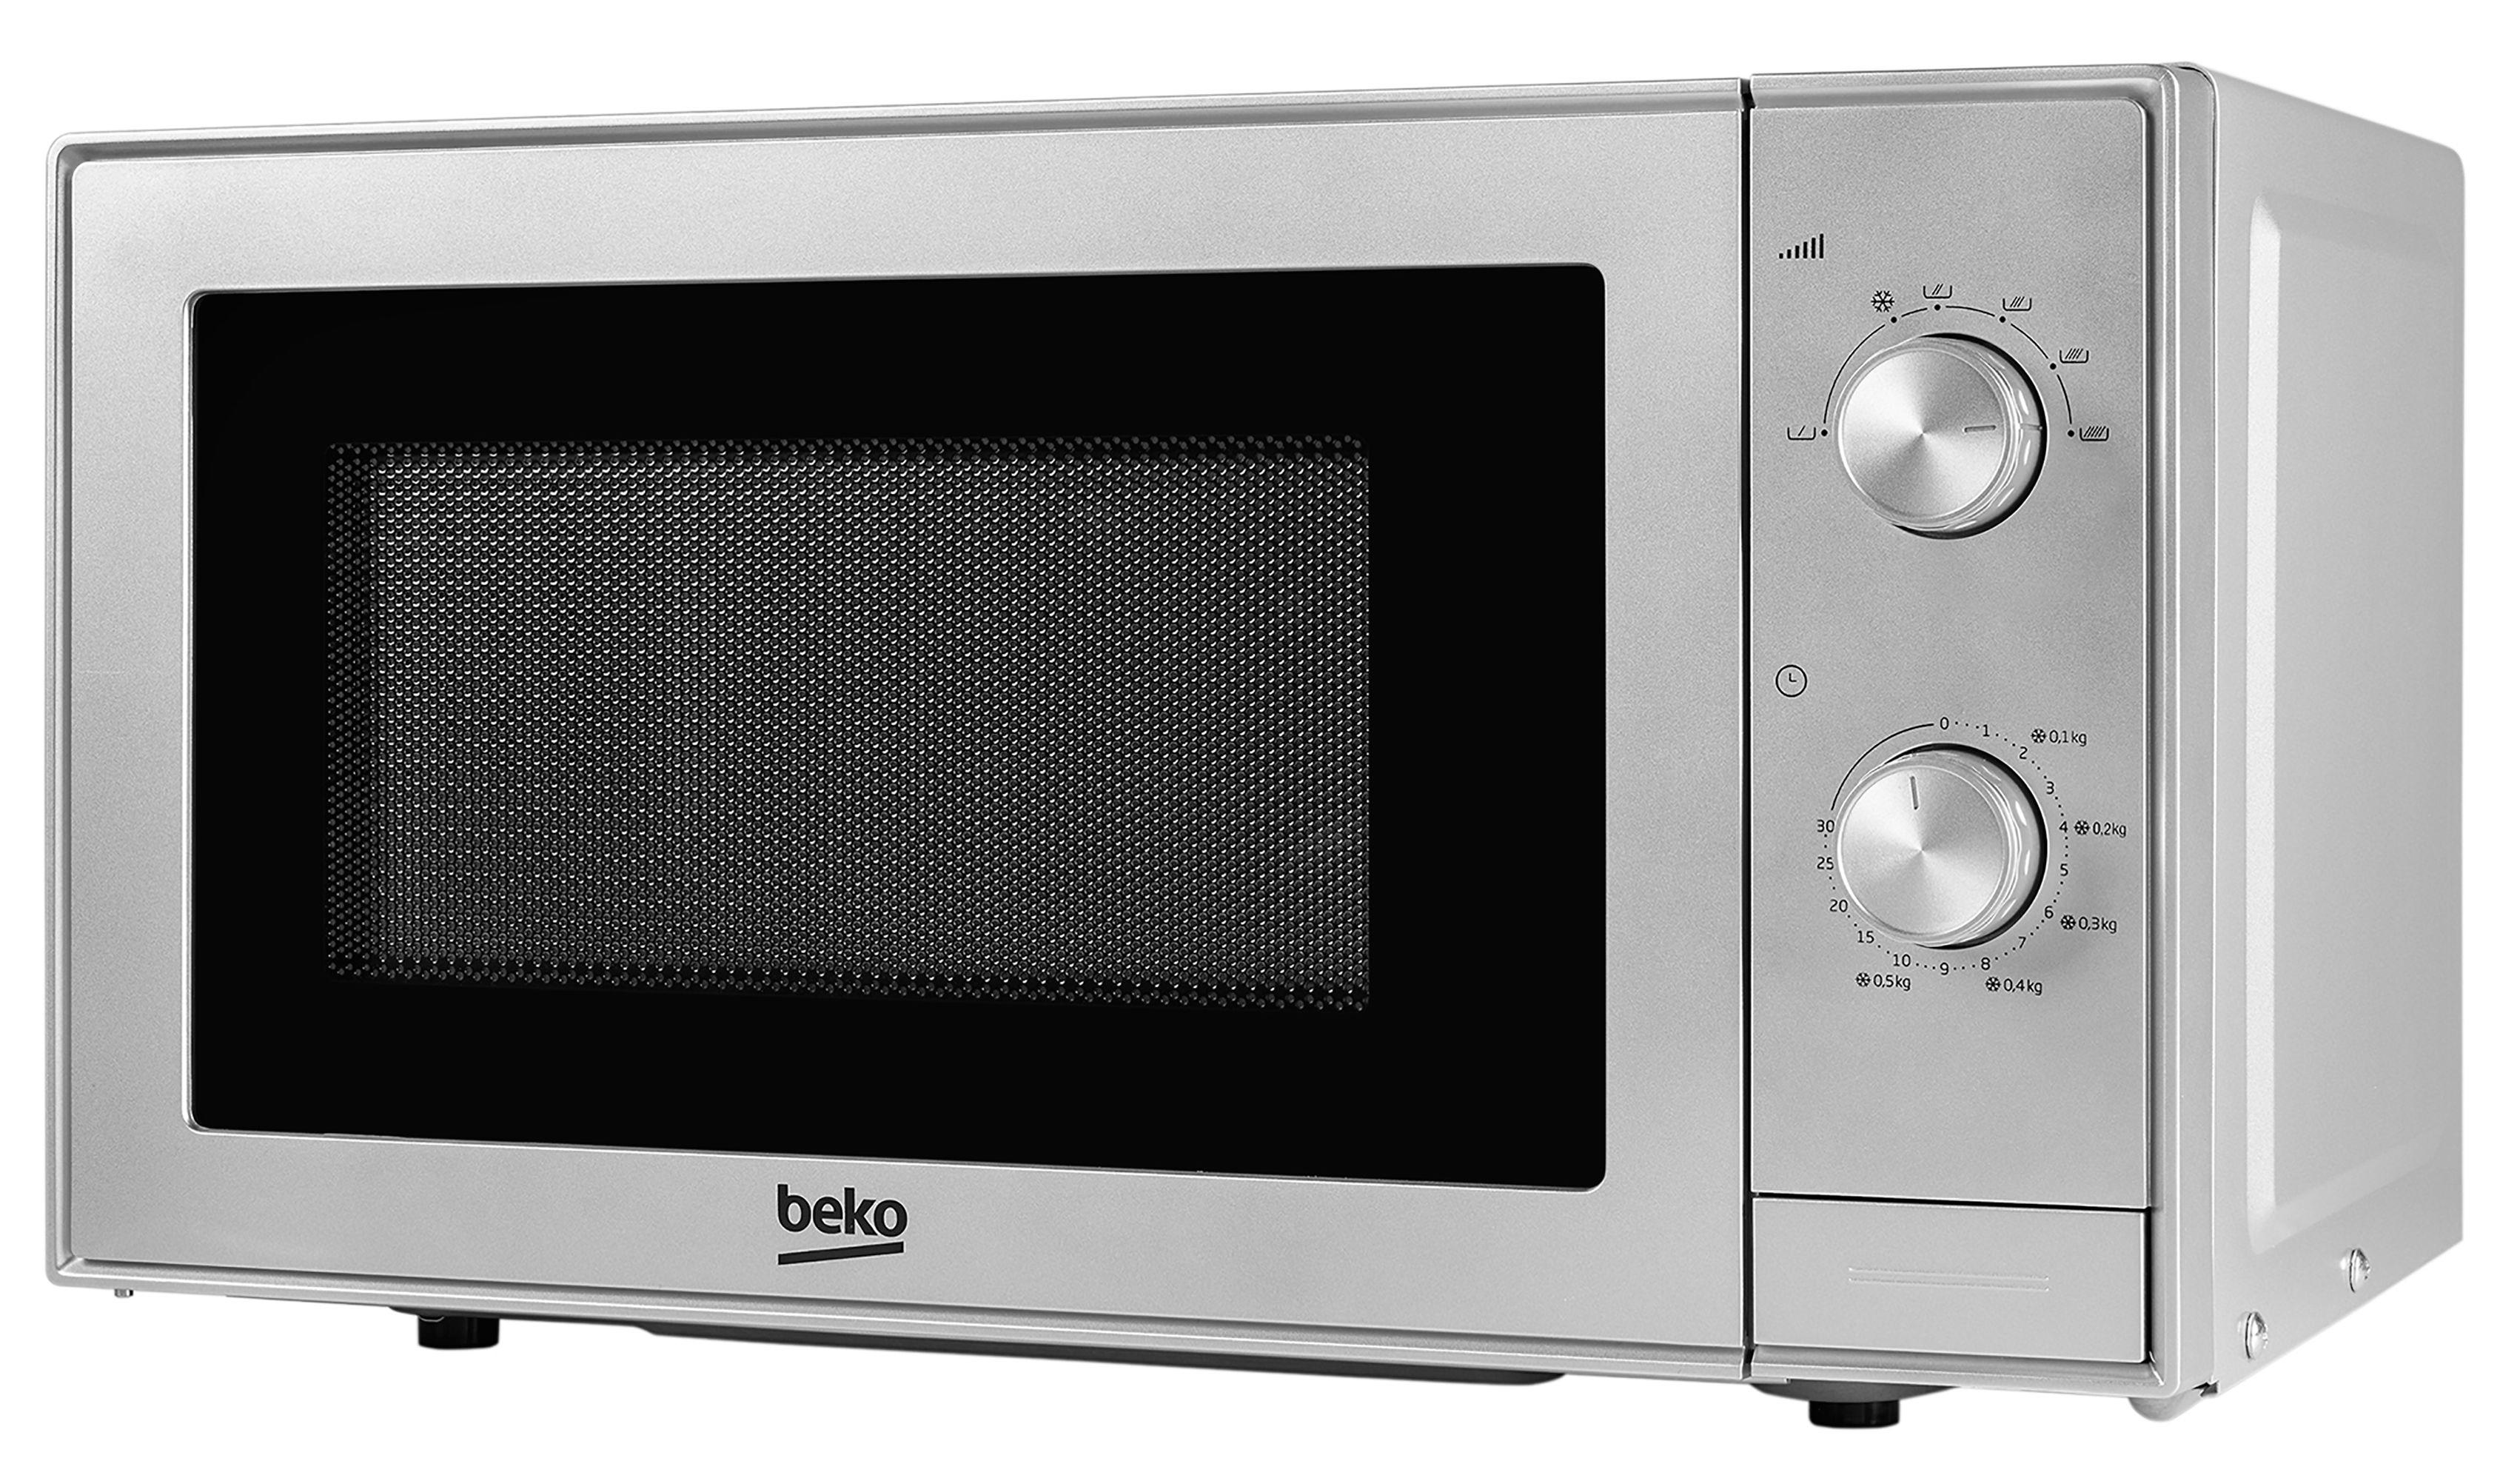 Beko MOC20100S 700W Microwave £39 with free C&C @ B&Q